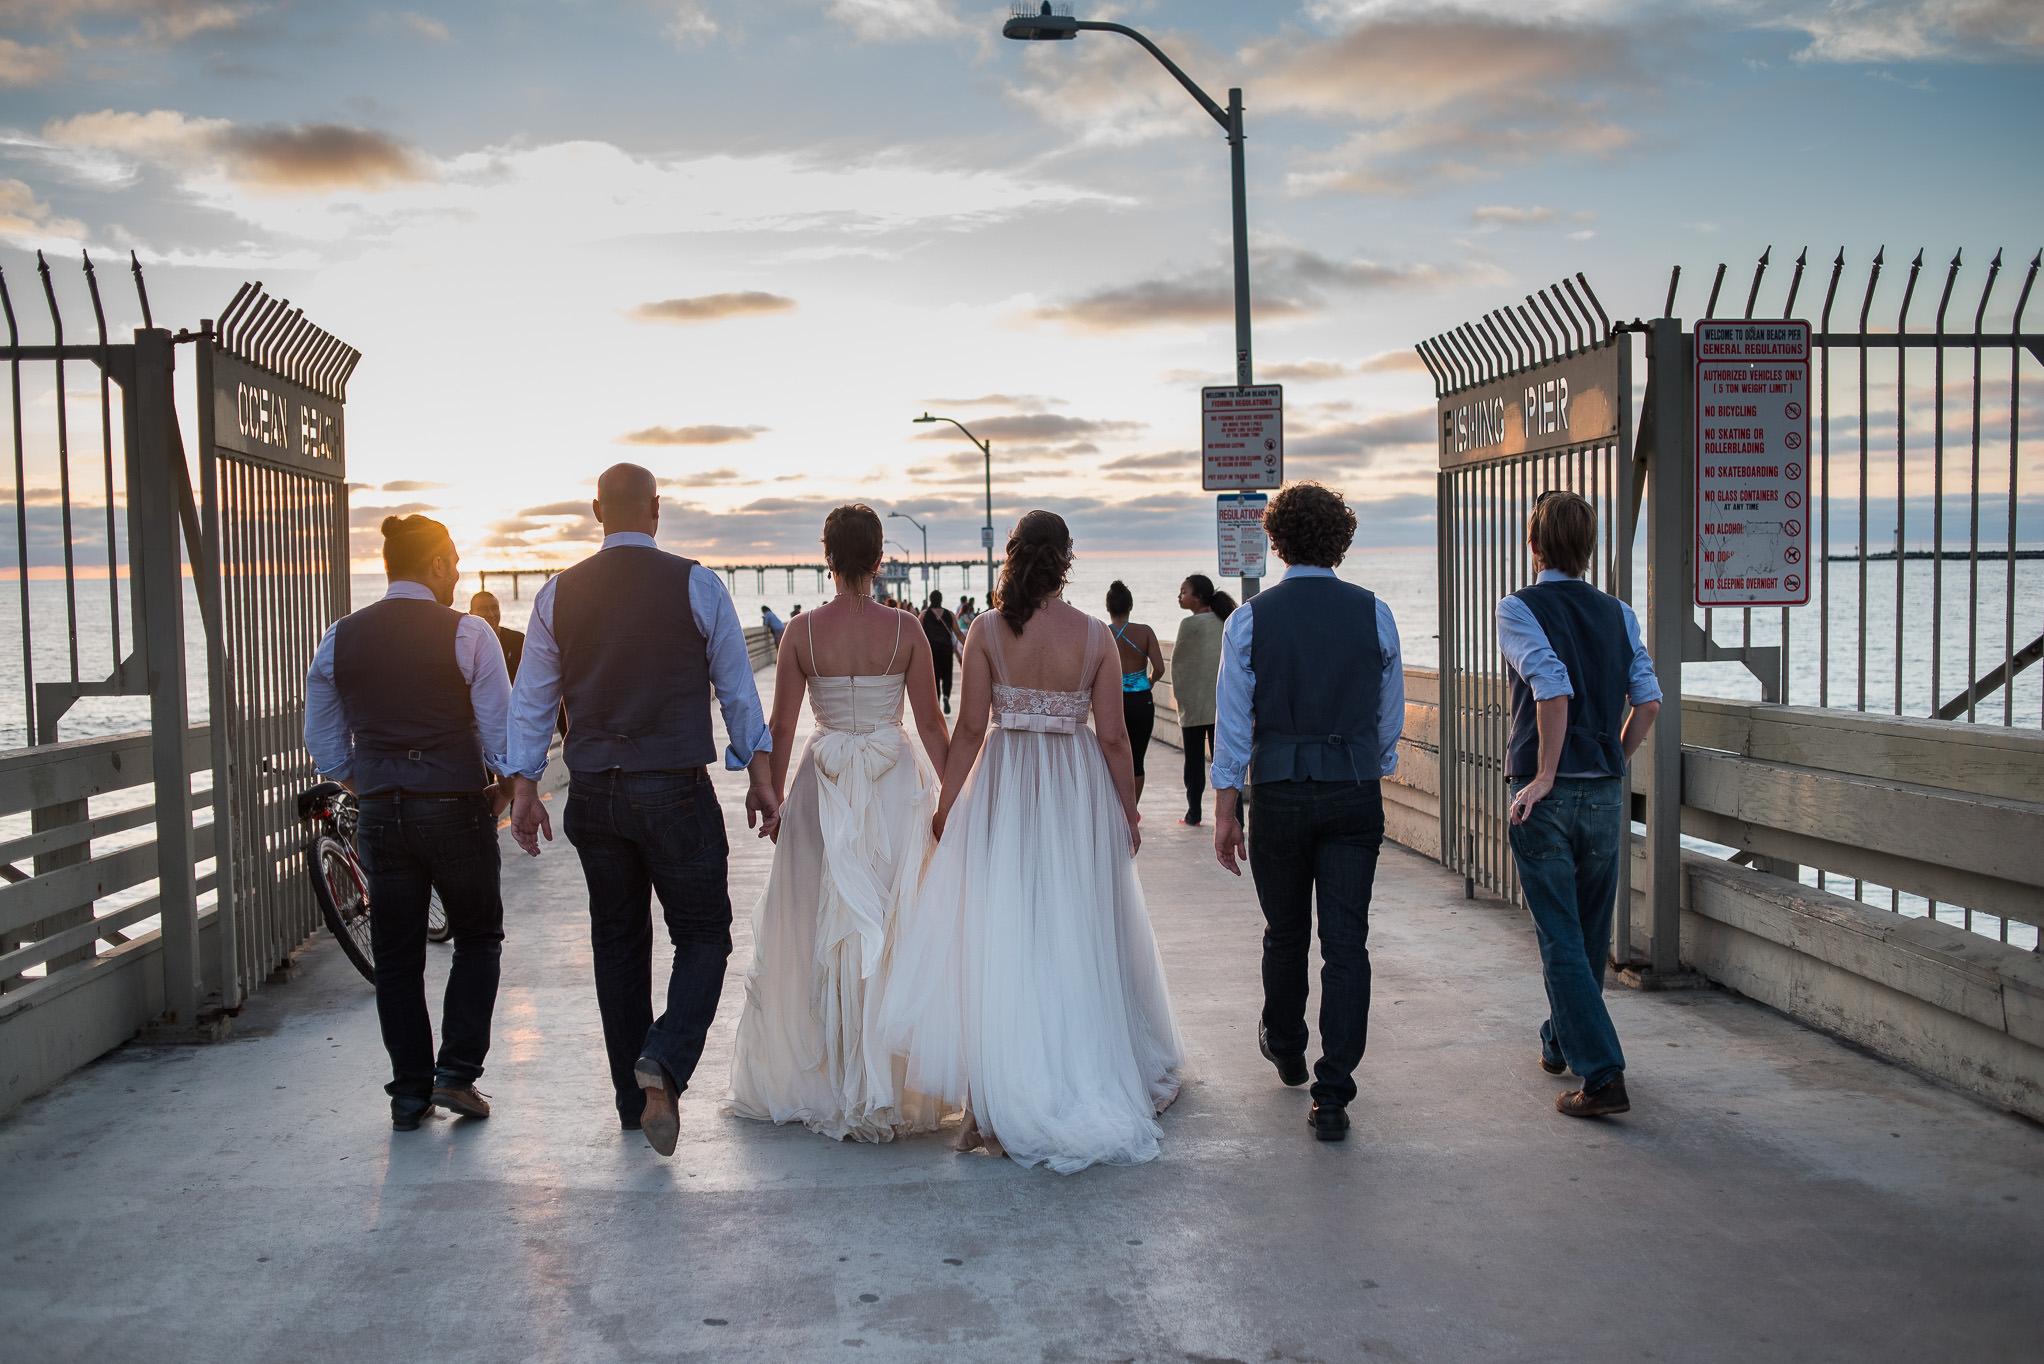 Two brides in Sand Diego walking pier with groomsmen